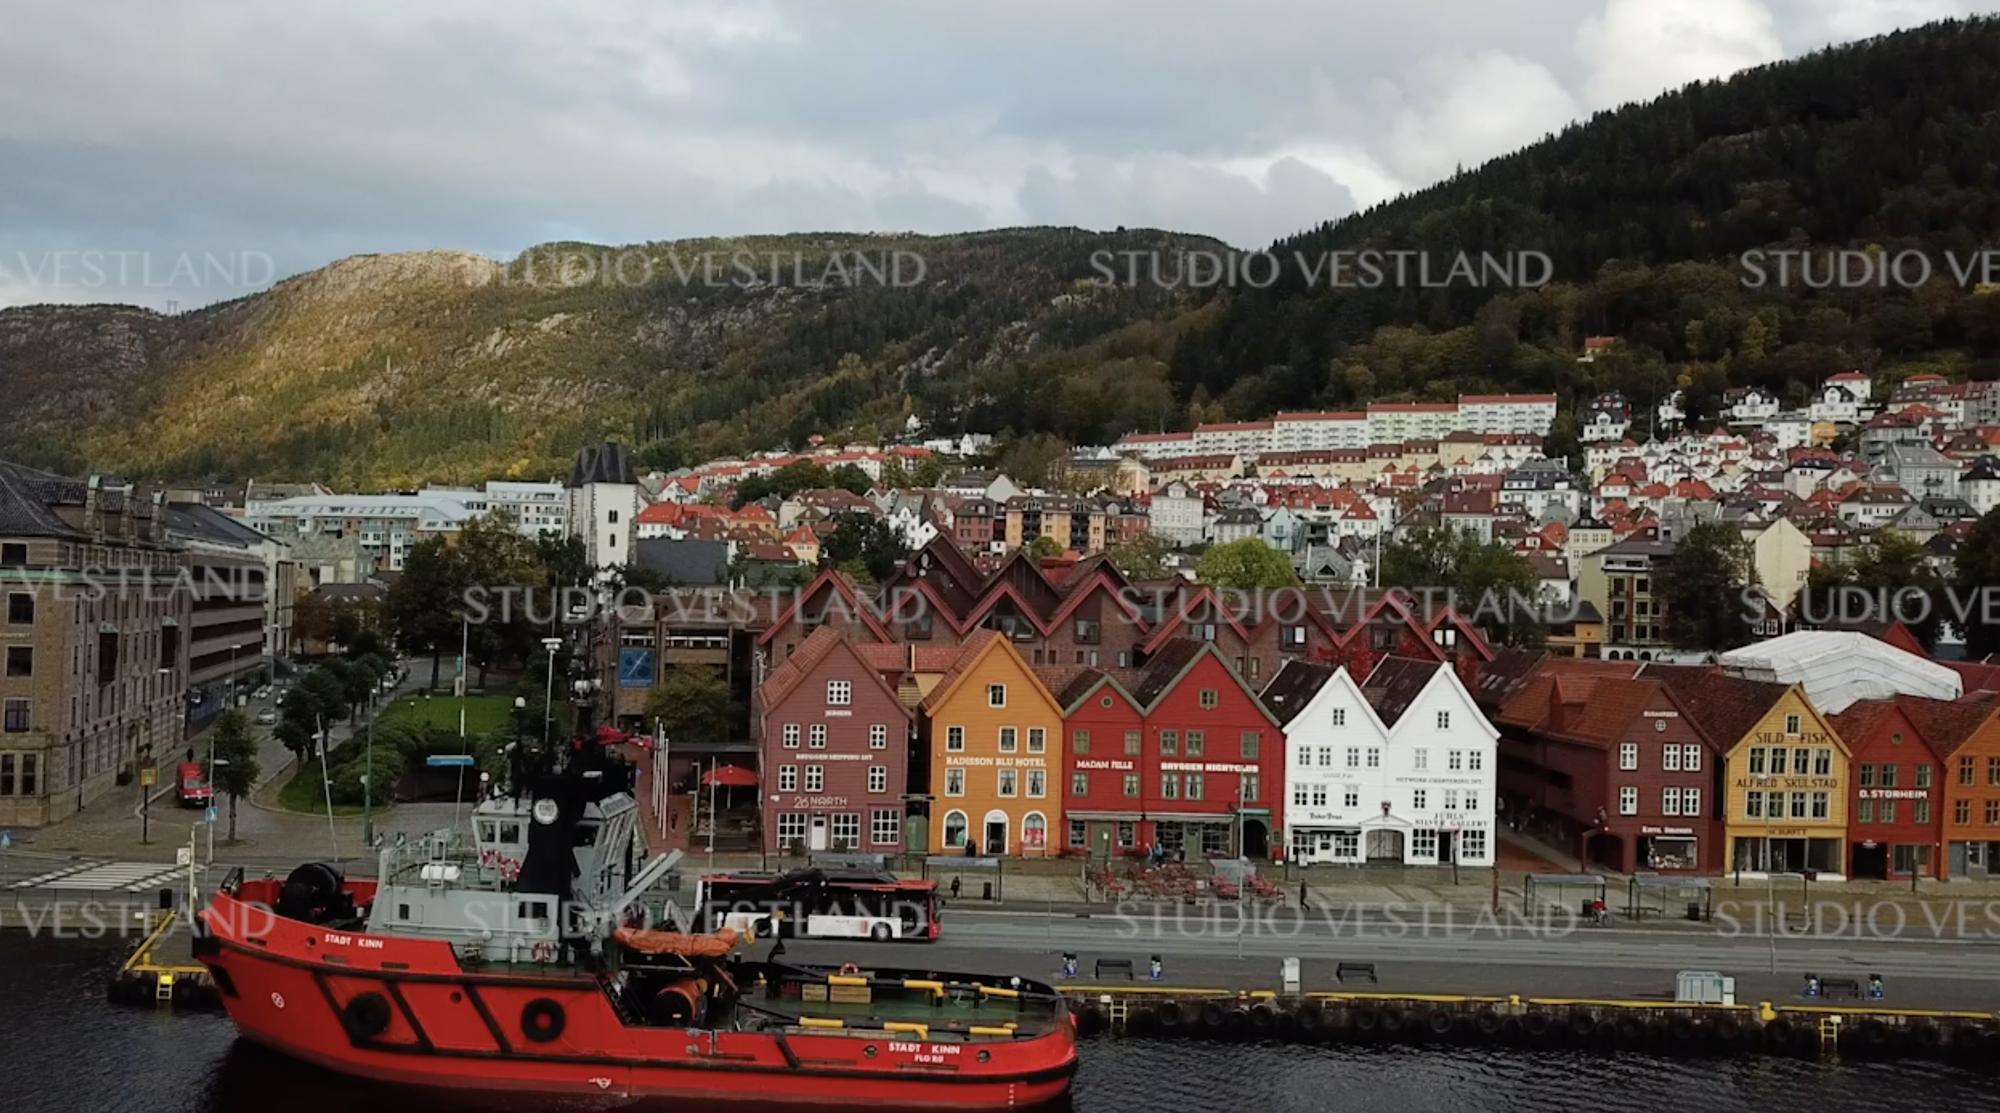 Studio Vestland - Bergen V19